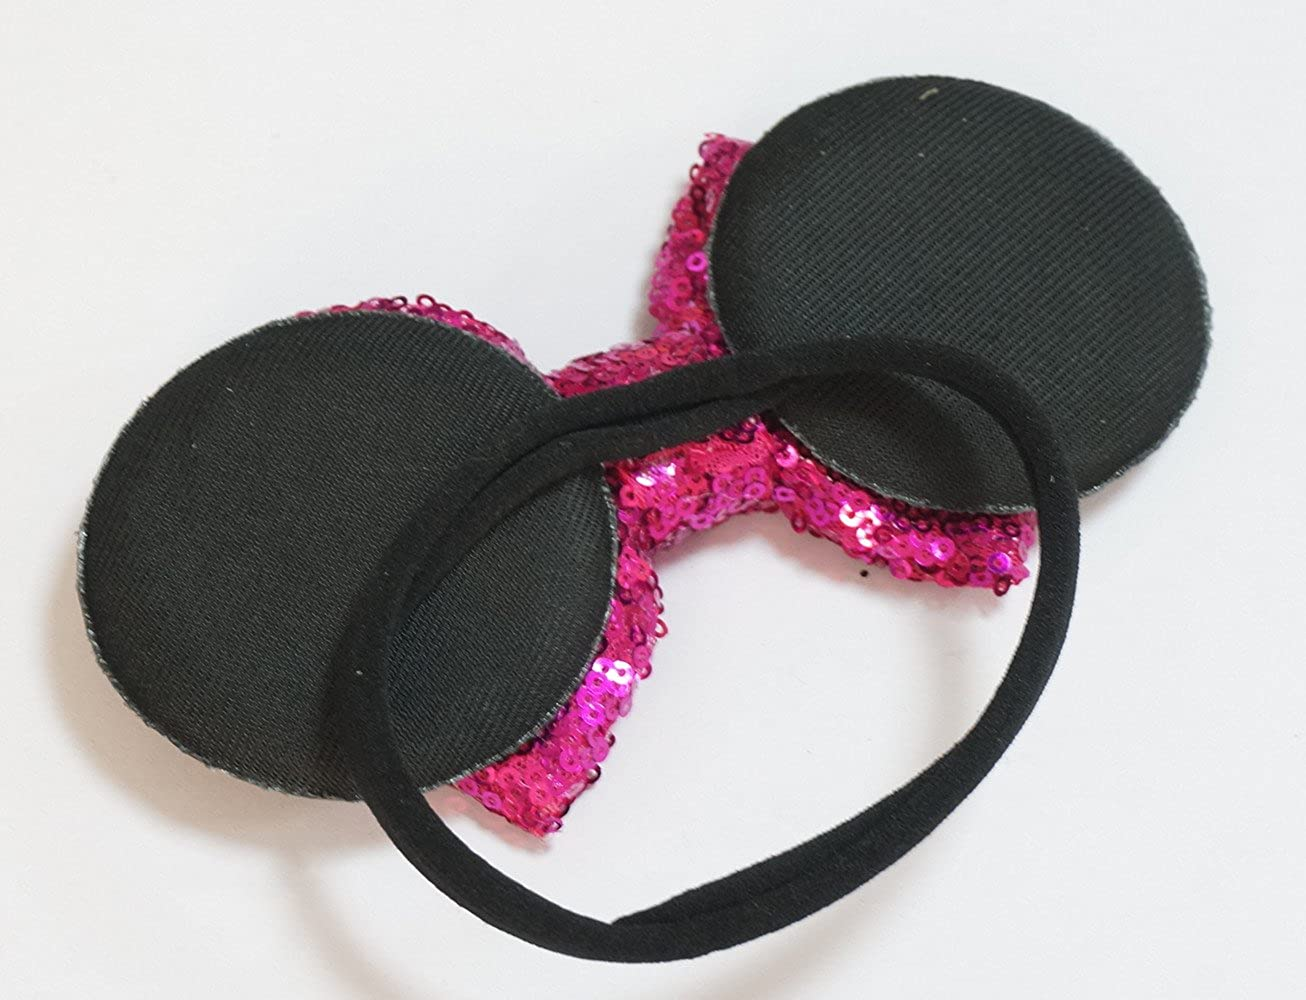 WINZIK Headwear Baby Boys Girls Kids Sequins Bowknot Ears Hairband Birthday Party Favor Princess Headband